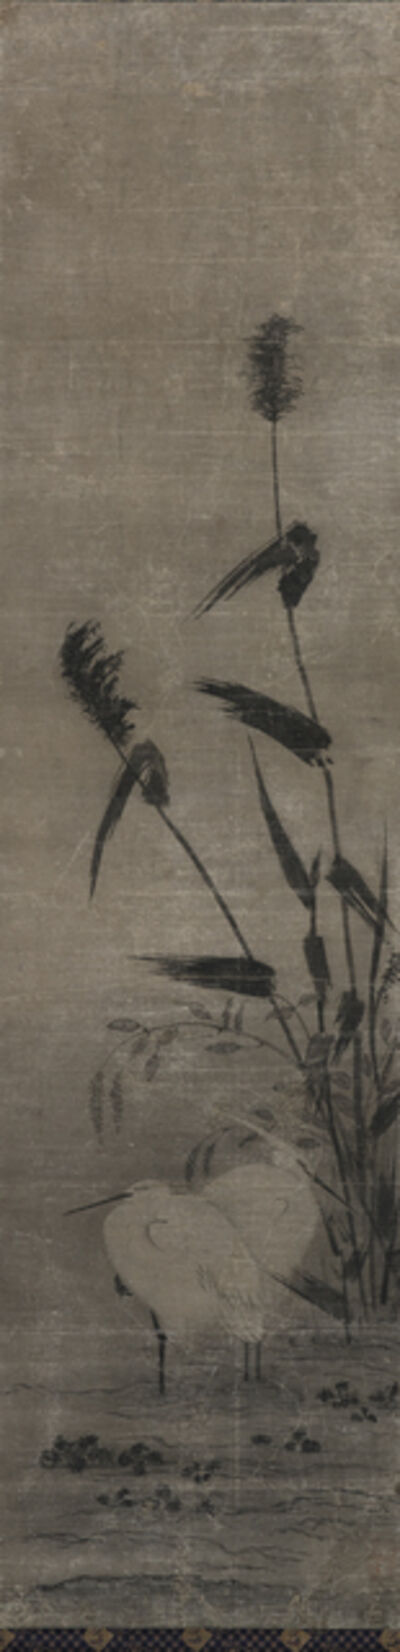 Yamaguchi Sekkei, 'Two Herons', 1644-1732